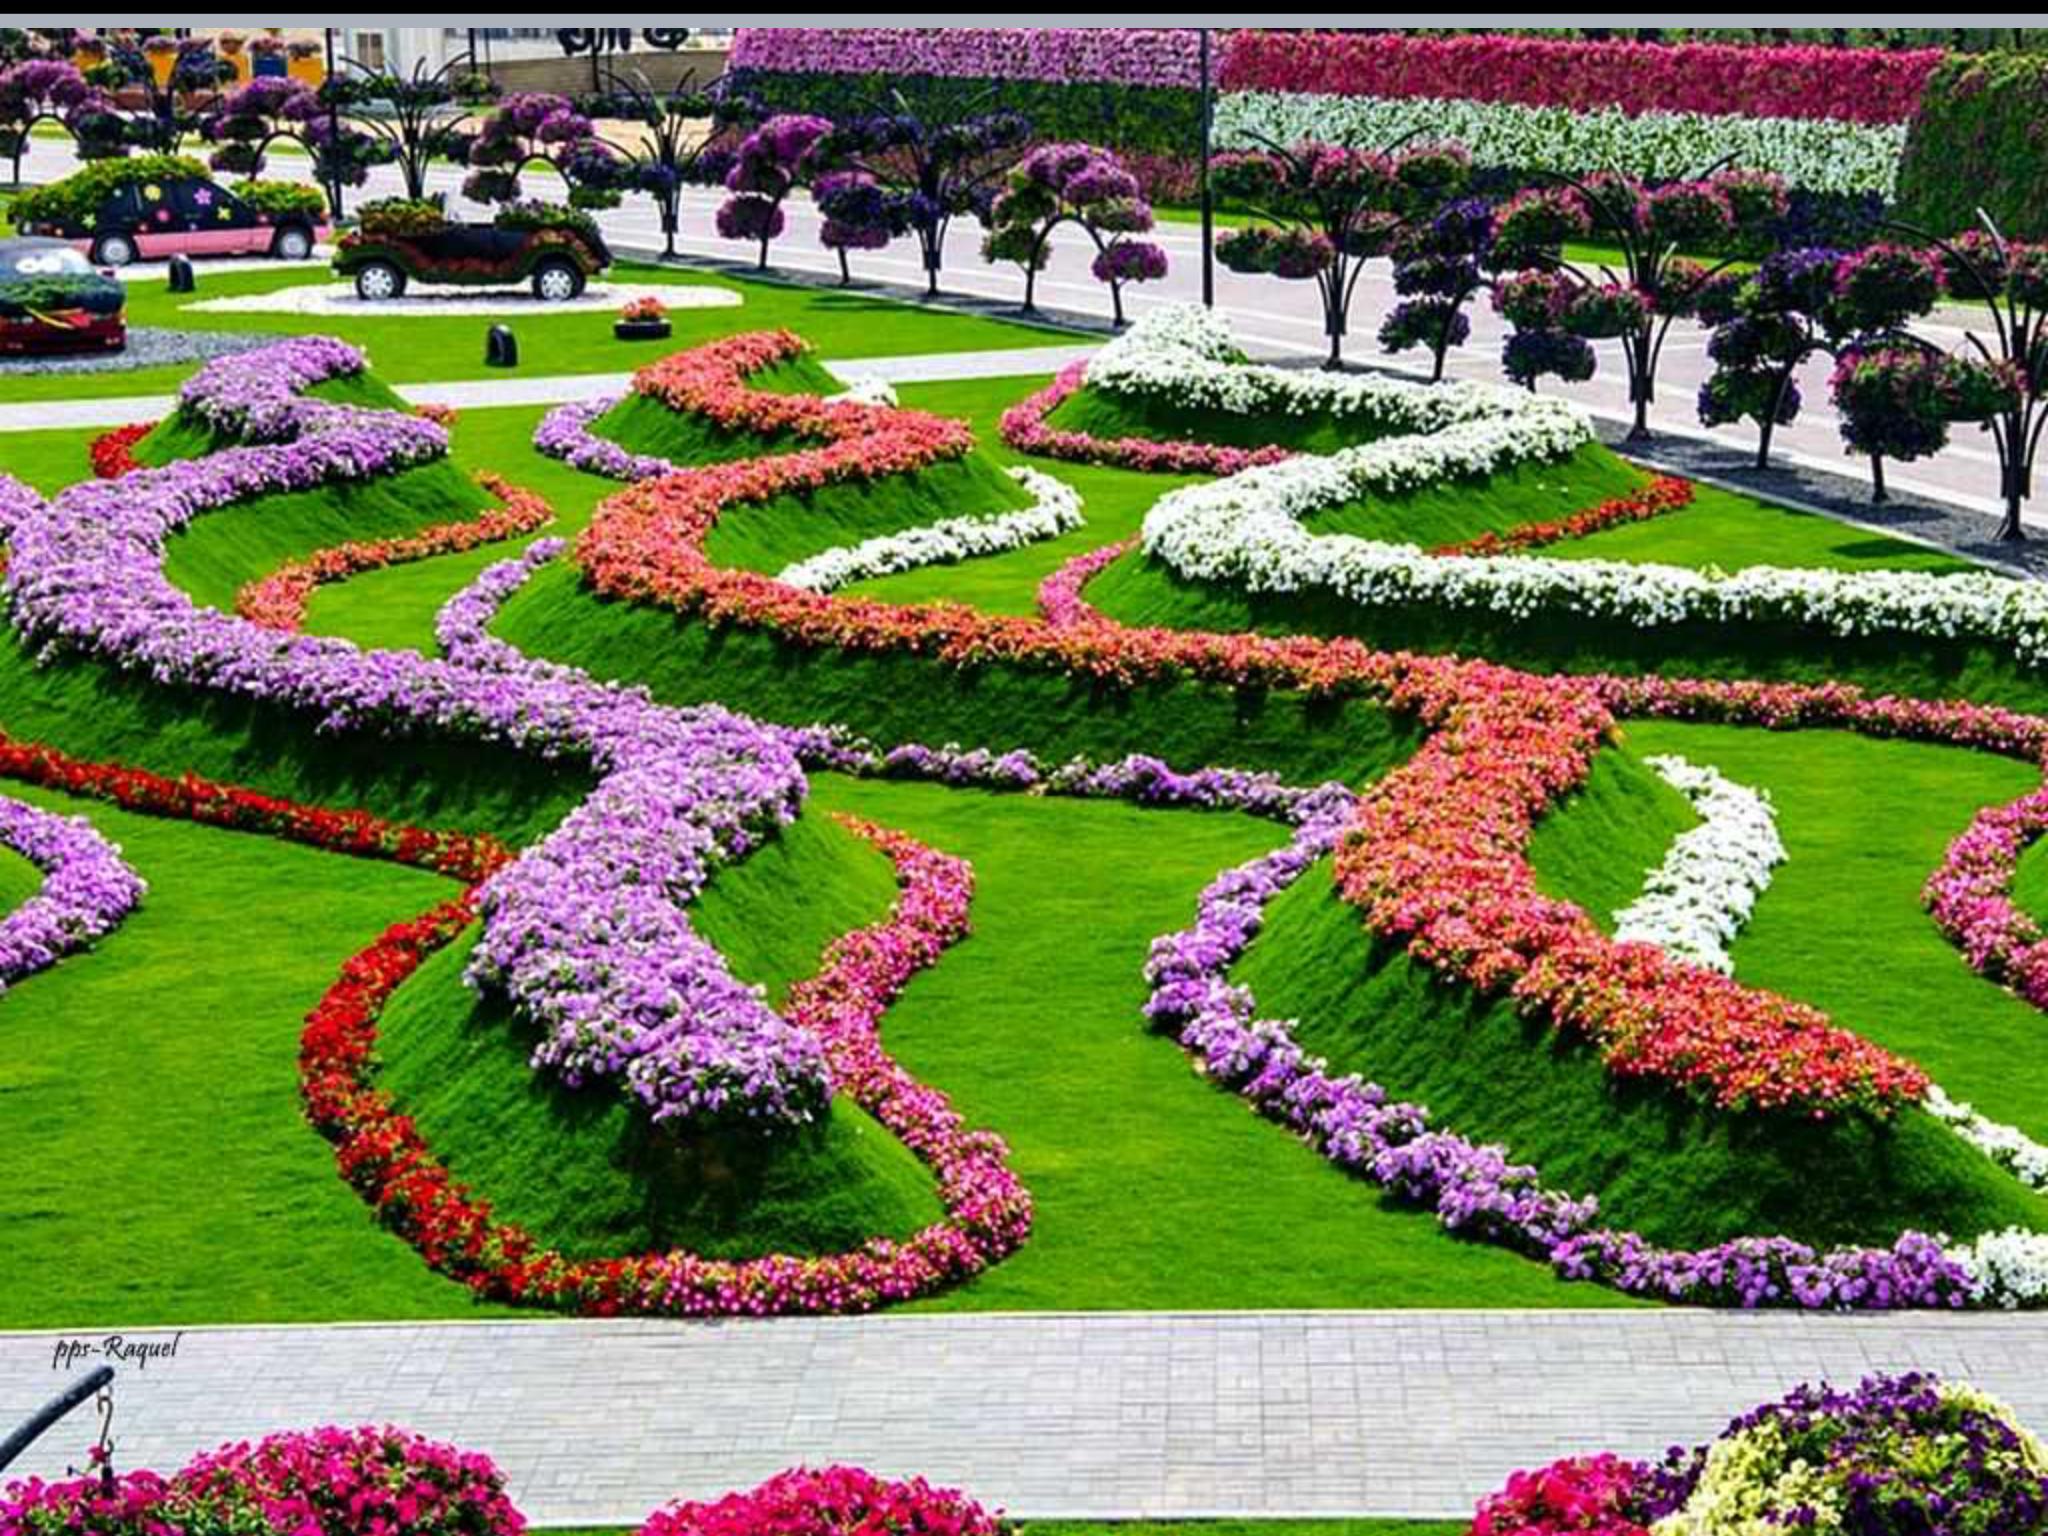 Pin by Booguy on Dubaï Miracle garden, Dubai garden